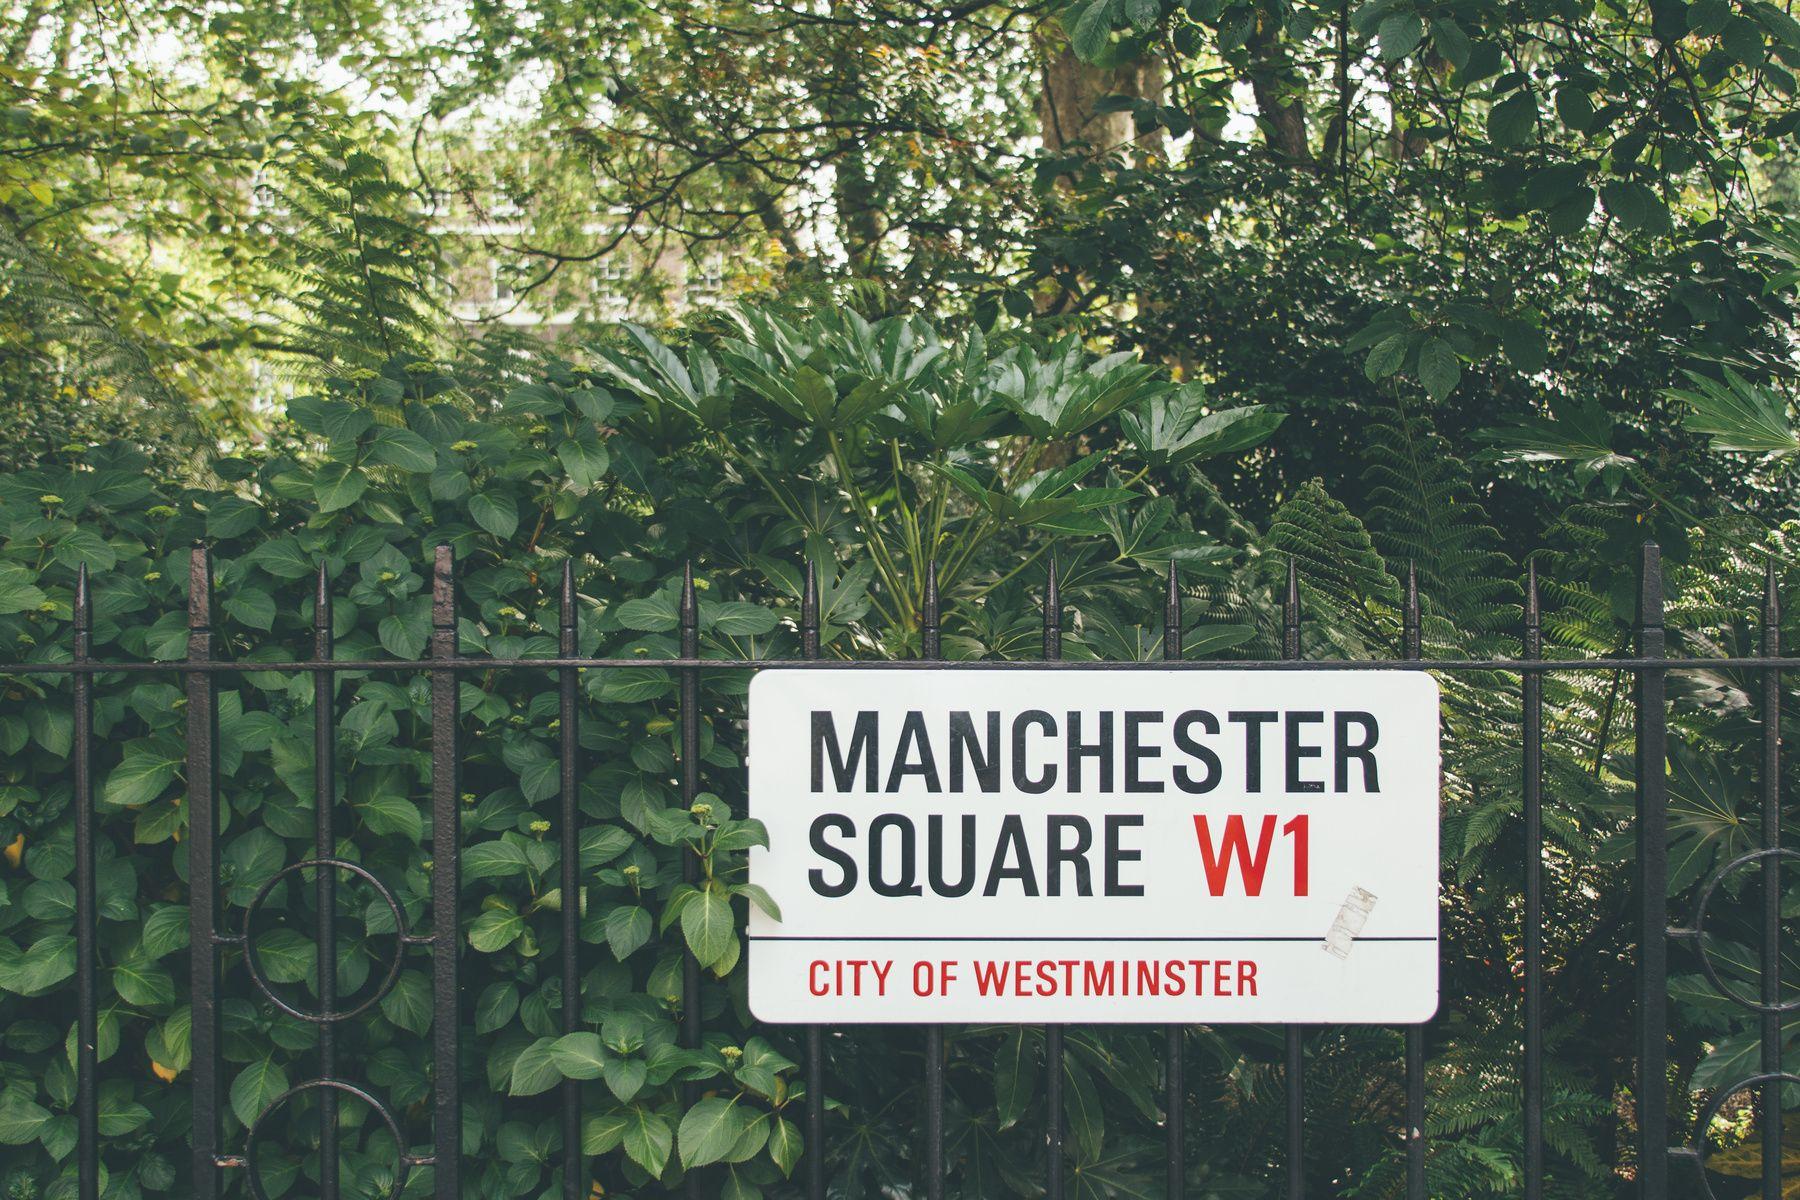 Joshua Duttweiler | Design | Photography | Buffalo NY - LONDON, ENGLAND | 2014